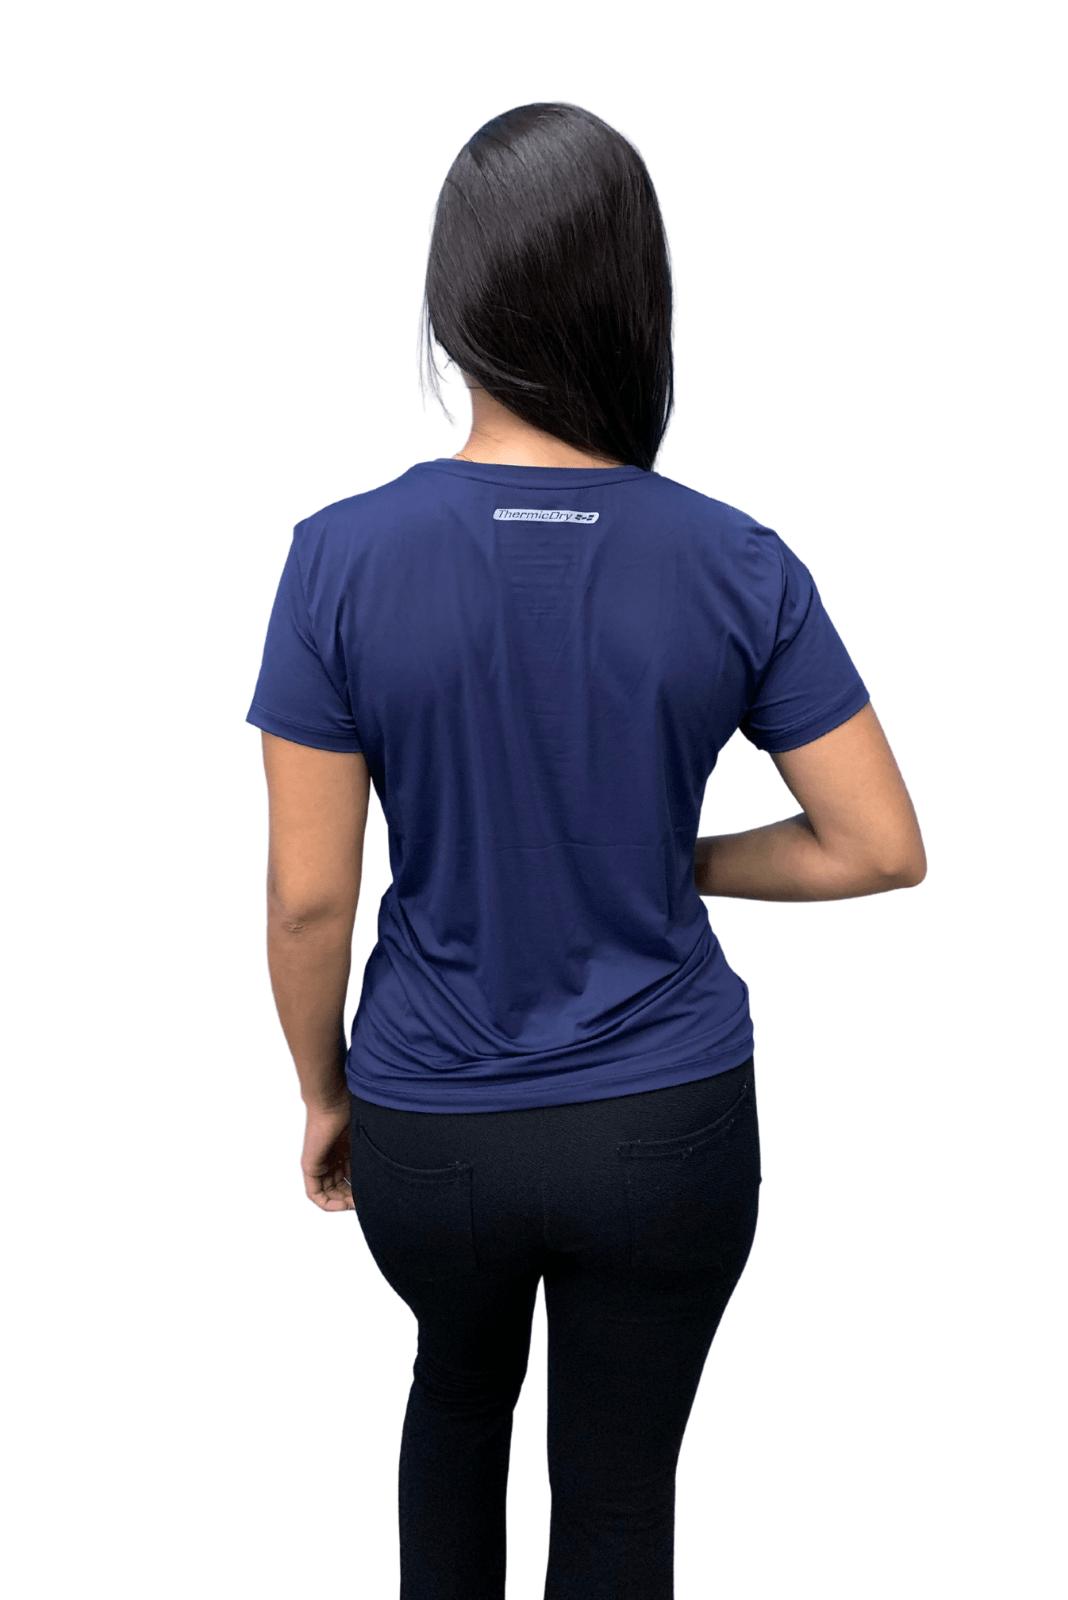 Camiseta Feminina Hifen  UV 50+ Marinho